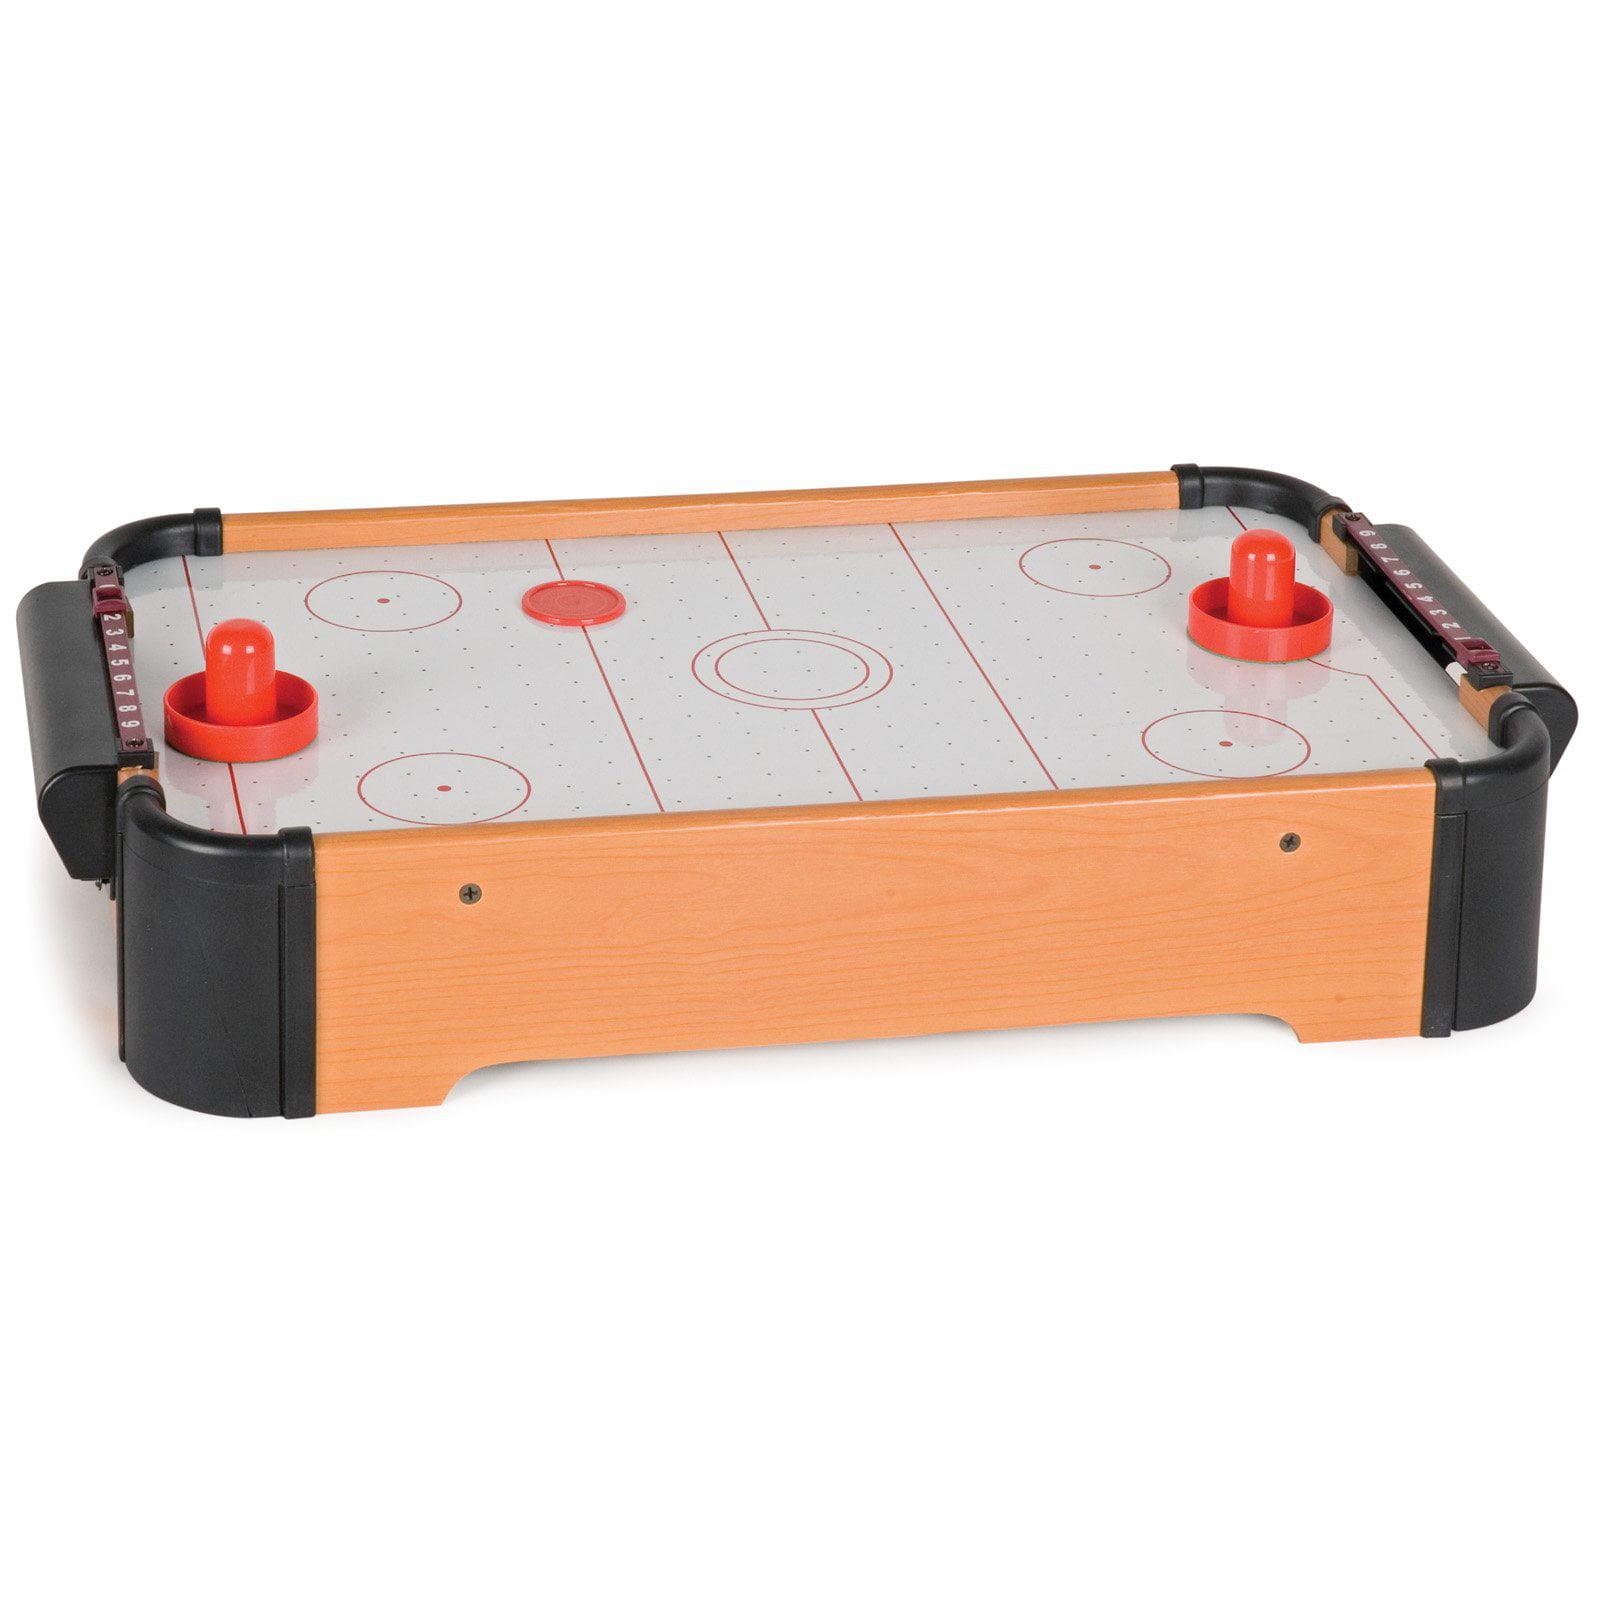 "CHH 21"" Mini Air Hockey Game Set"